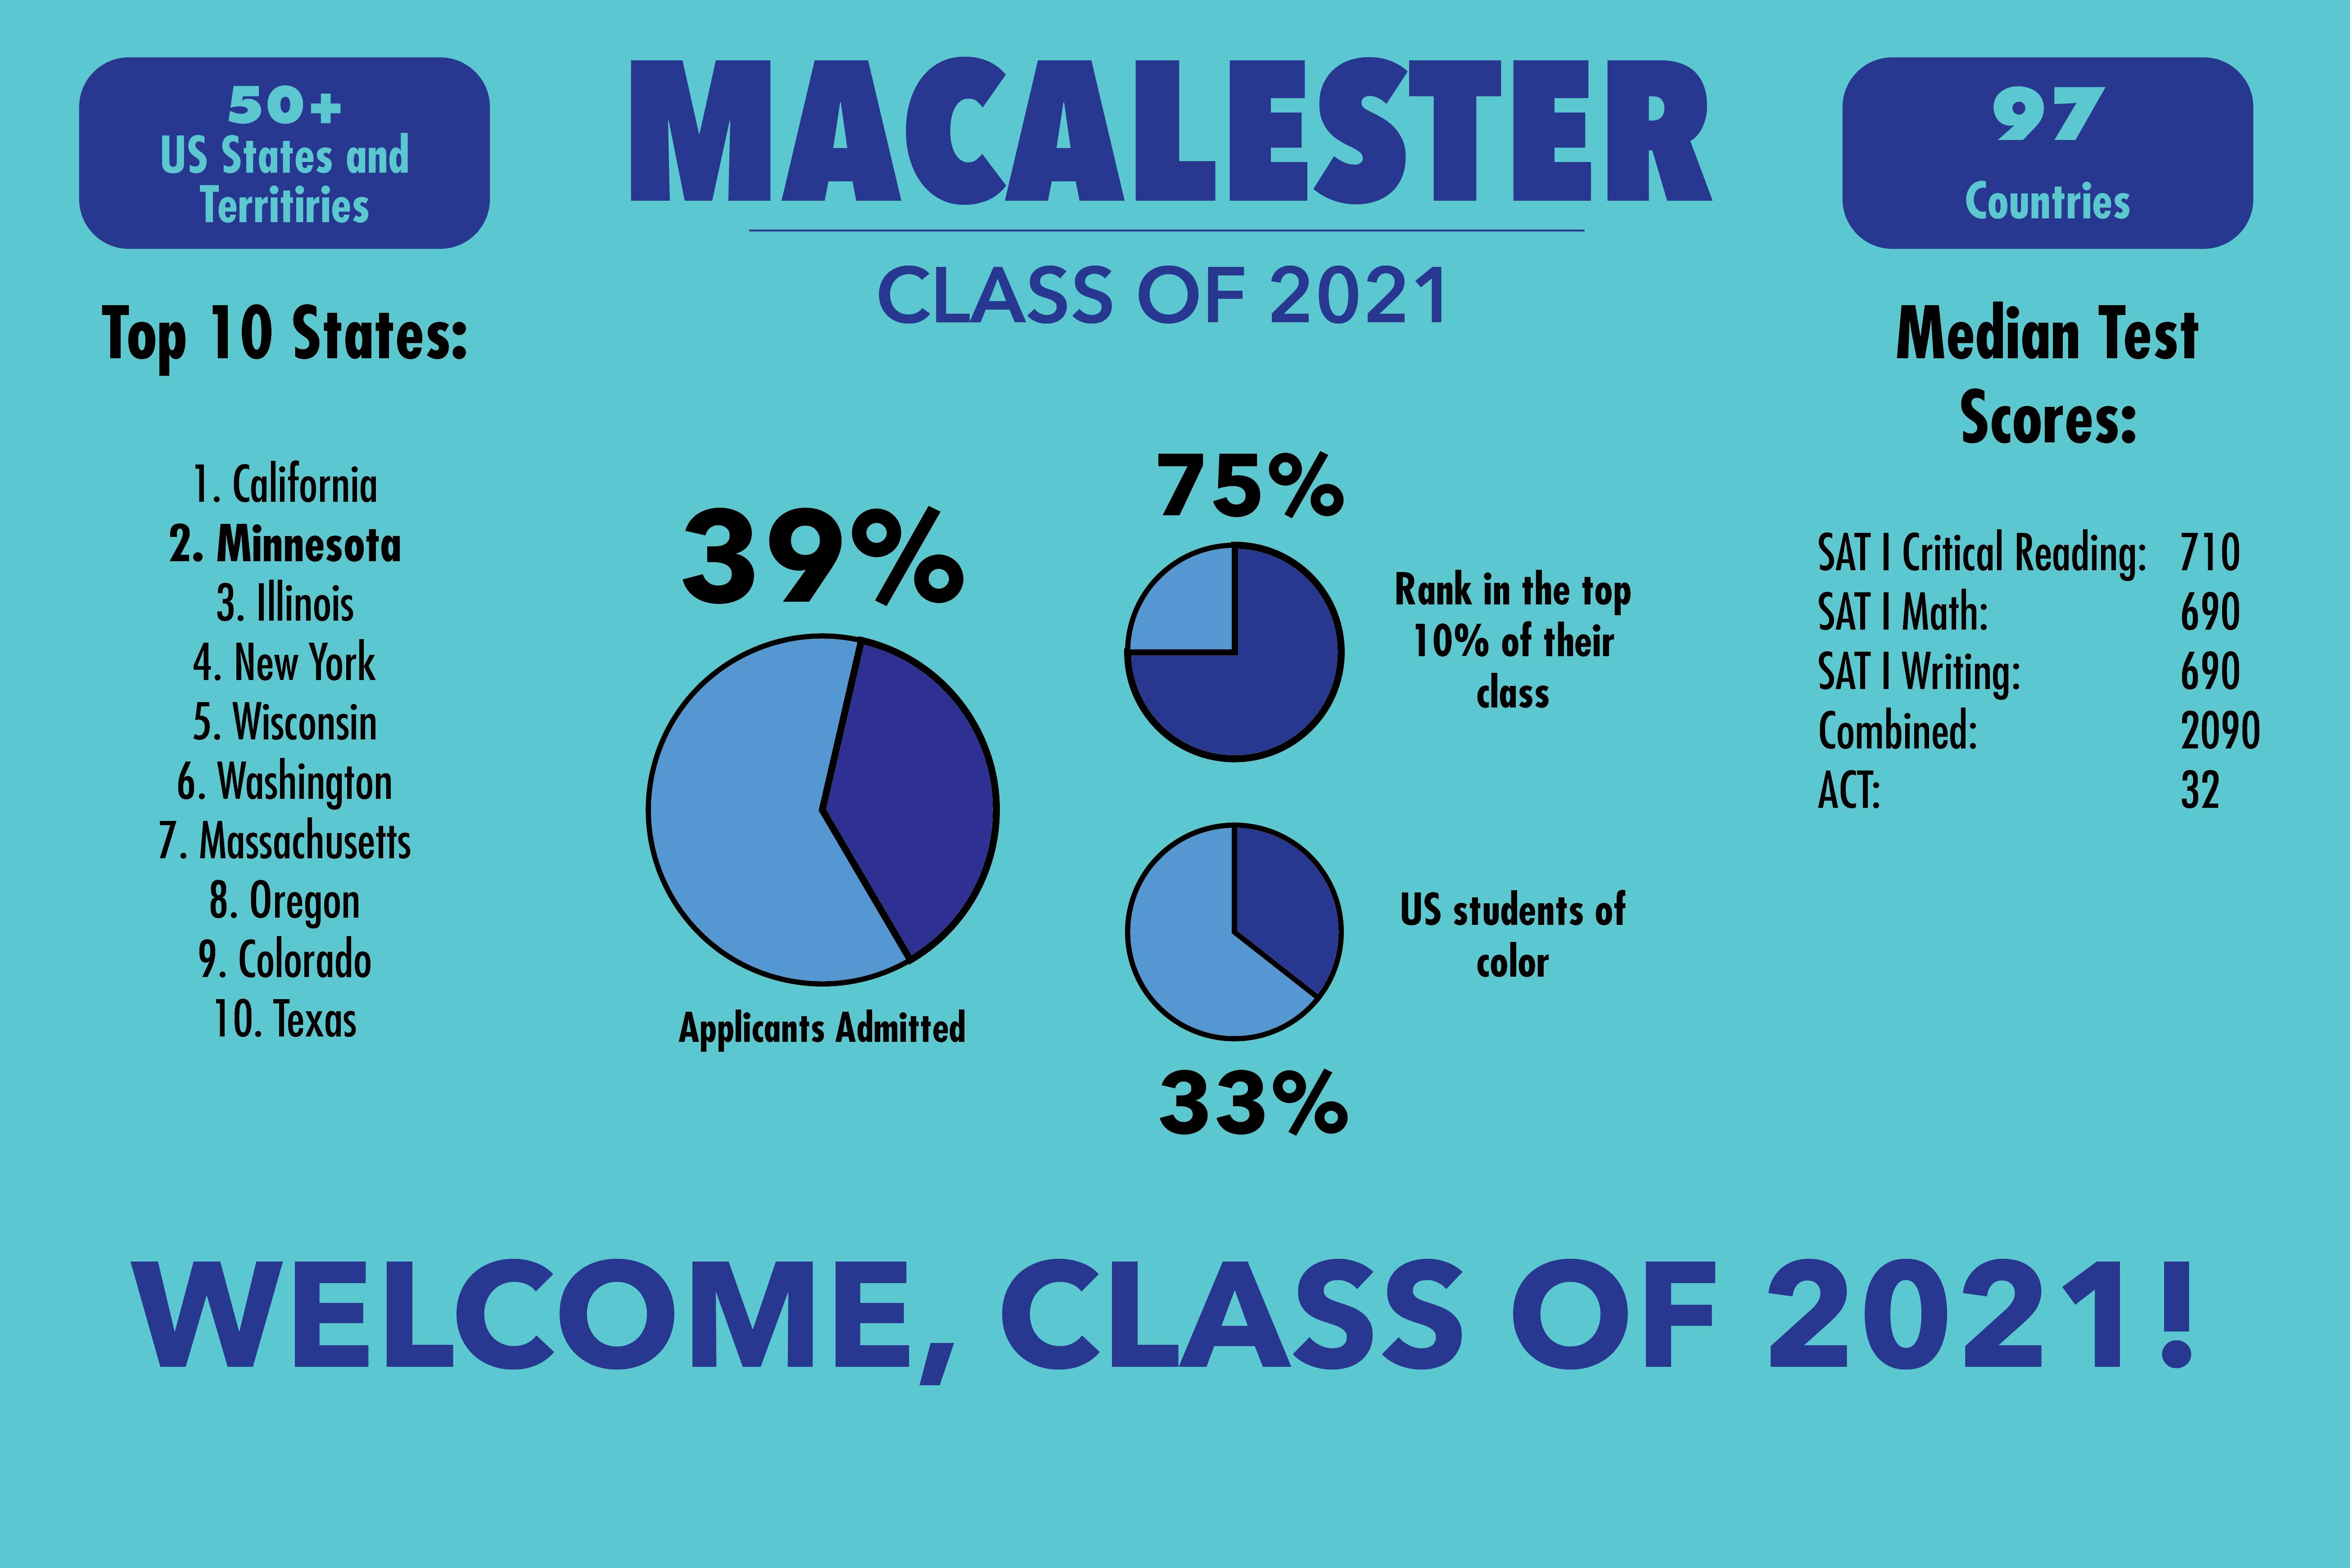 Class of 2021 includes QuestBridge applicants, matches recent trends